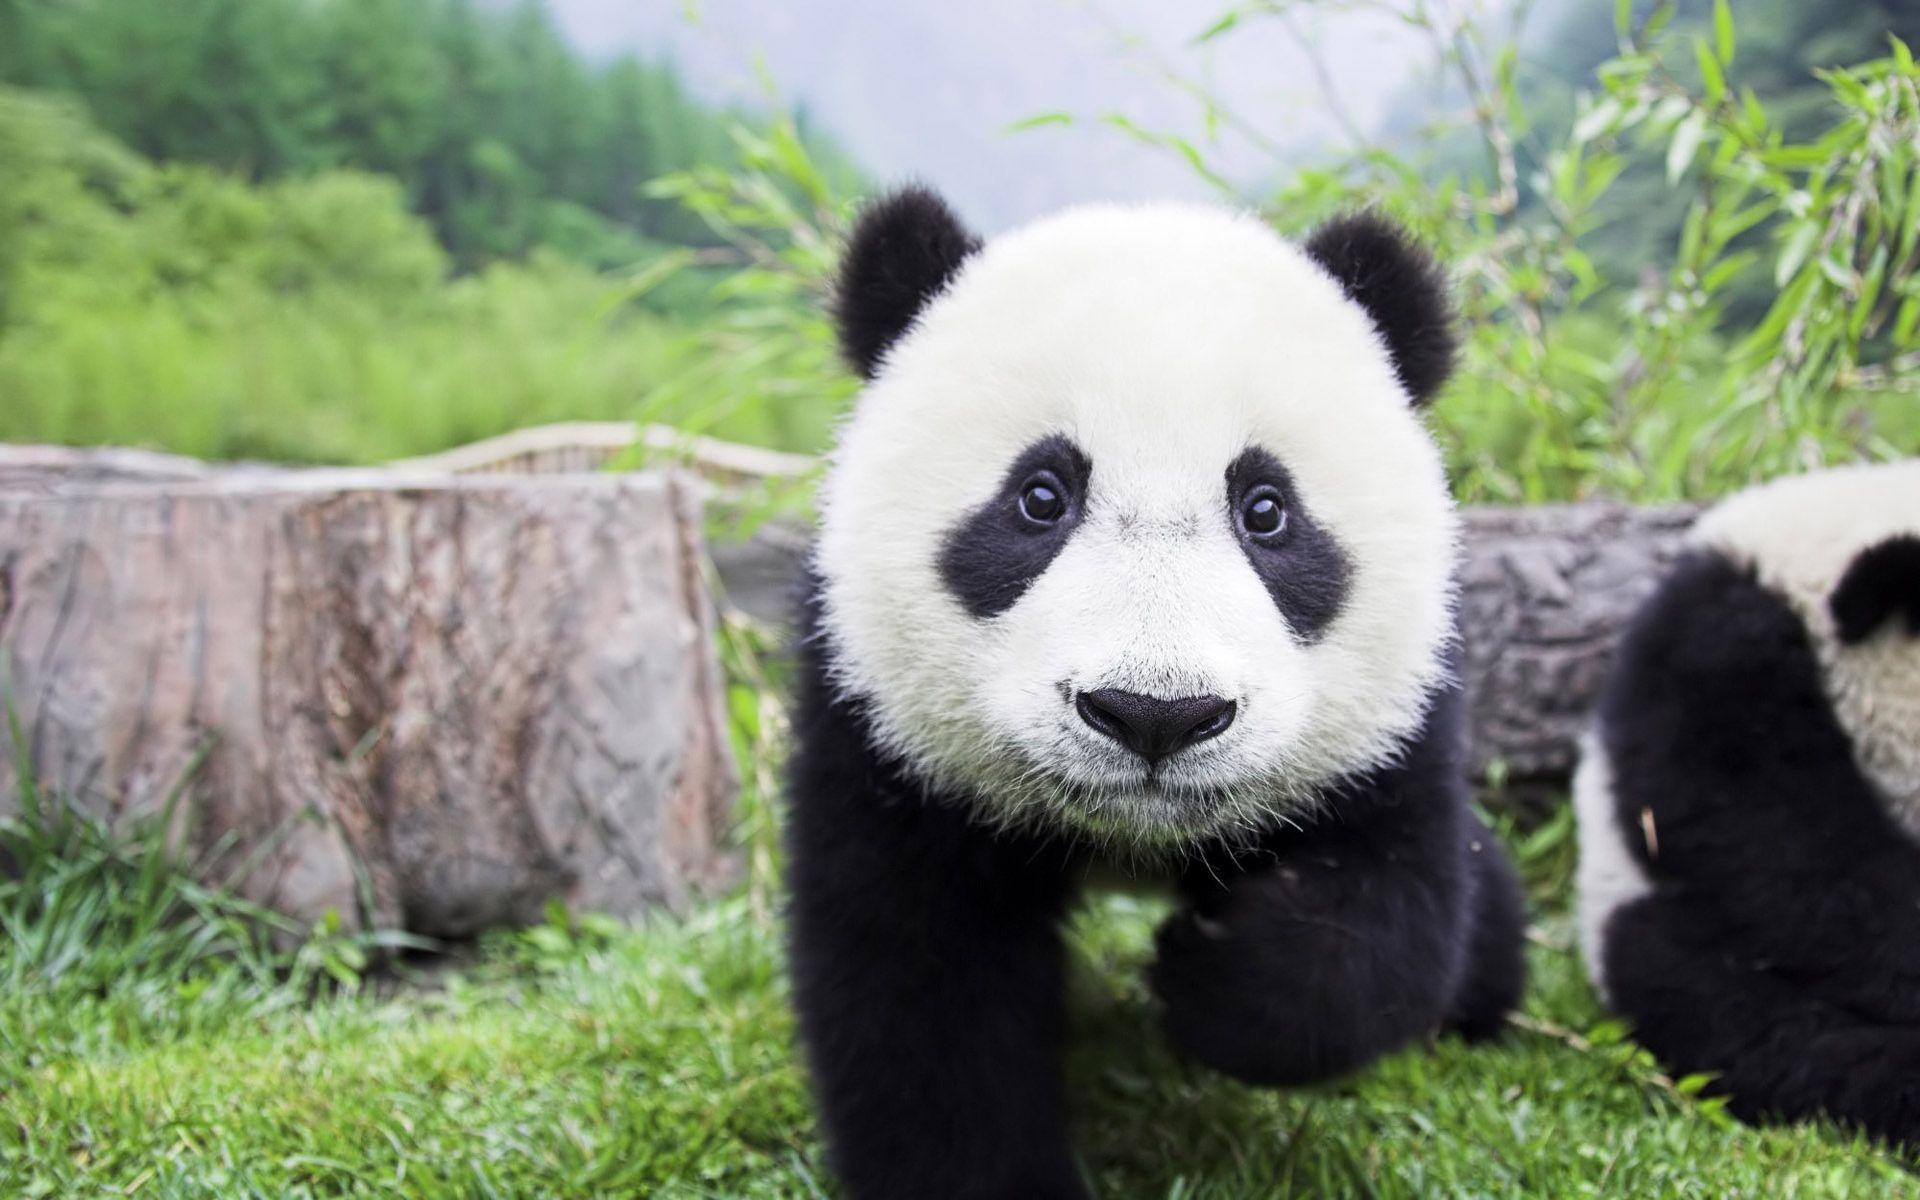 Panda Wallpapers - Full HD wallpaper search